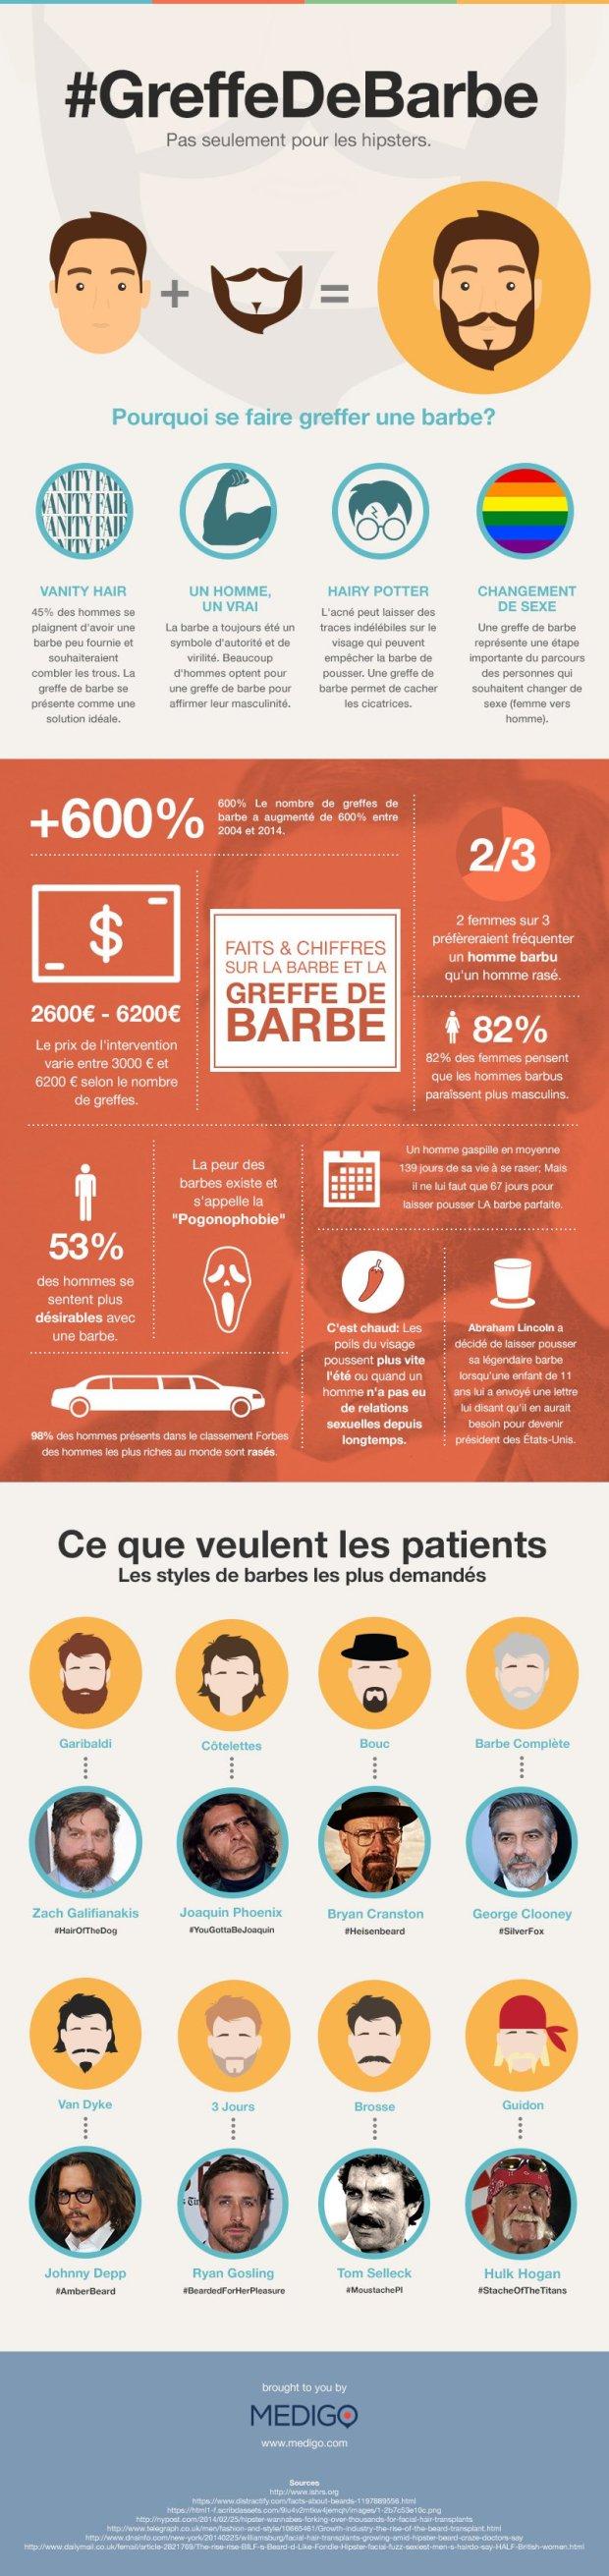 GreffedeBarbe-Infographie